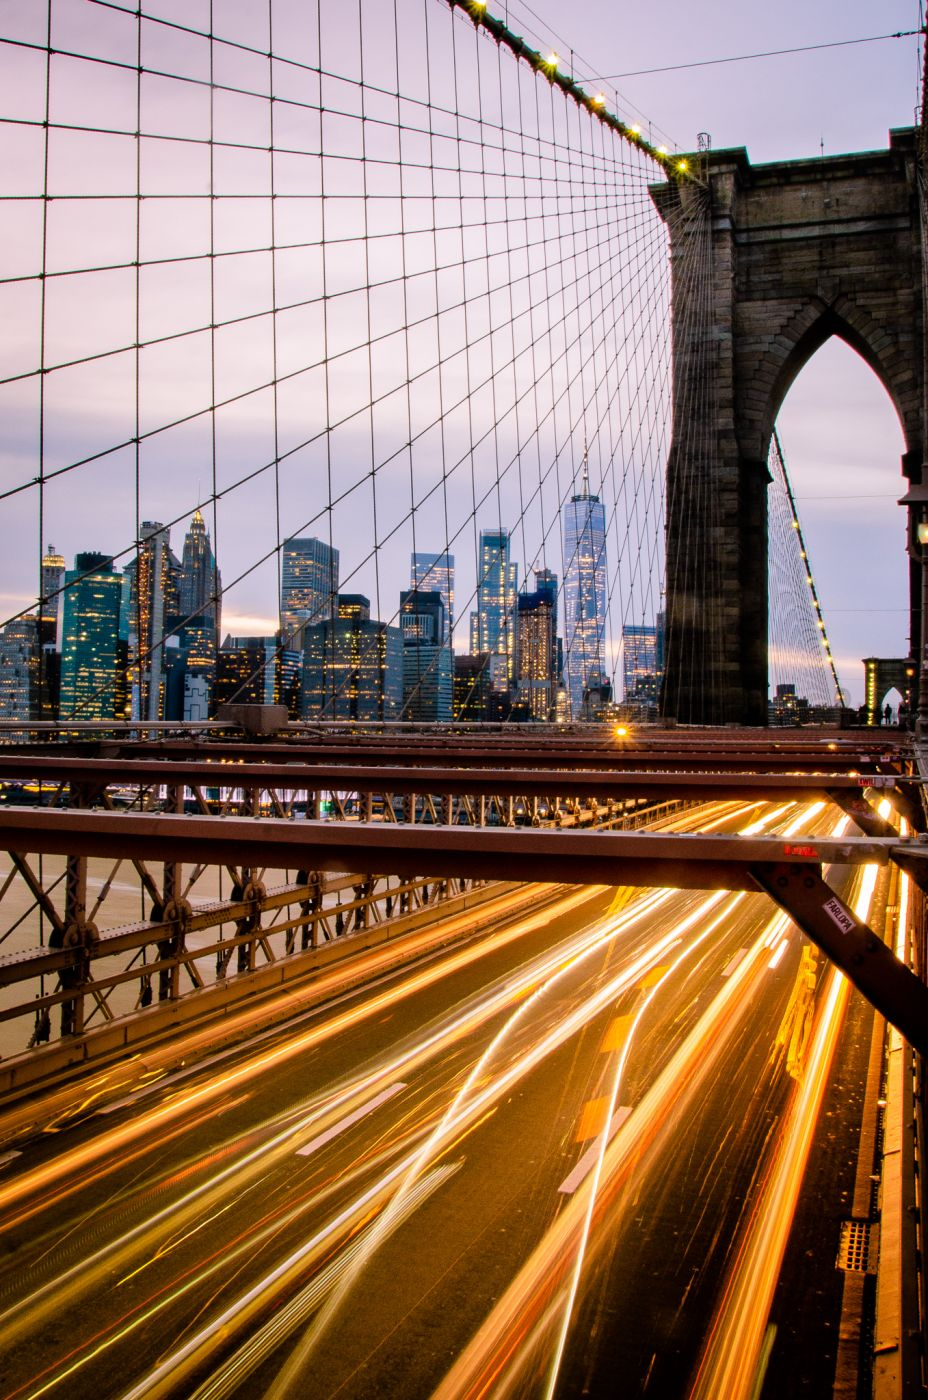 Nightime Views of NYC skyline from Brooklyn Bridge, USA